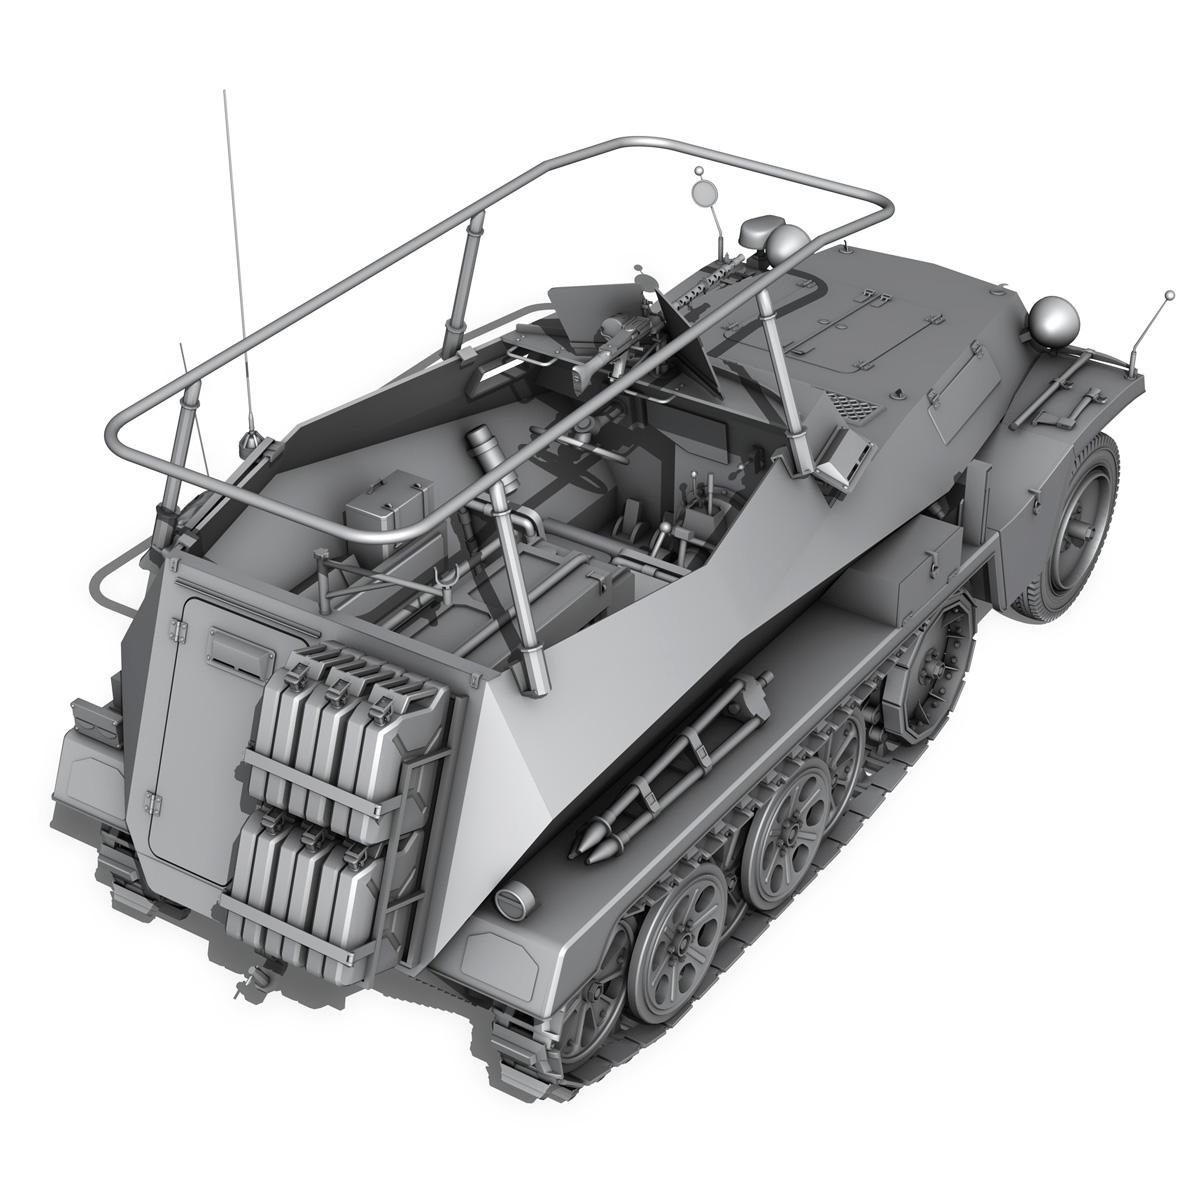 sdkfz 250 – command halftrack 3d model 3ds fbx c4d lwo obj 251673